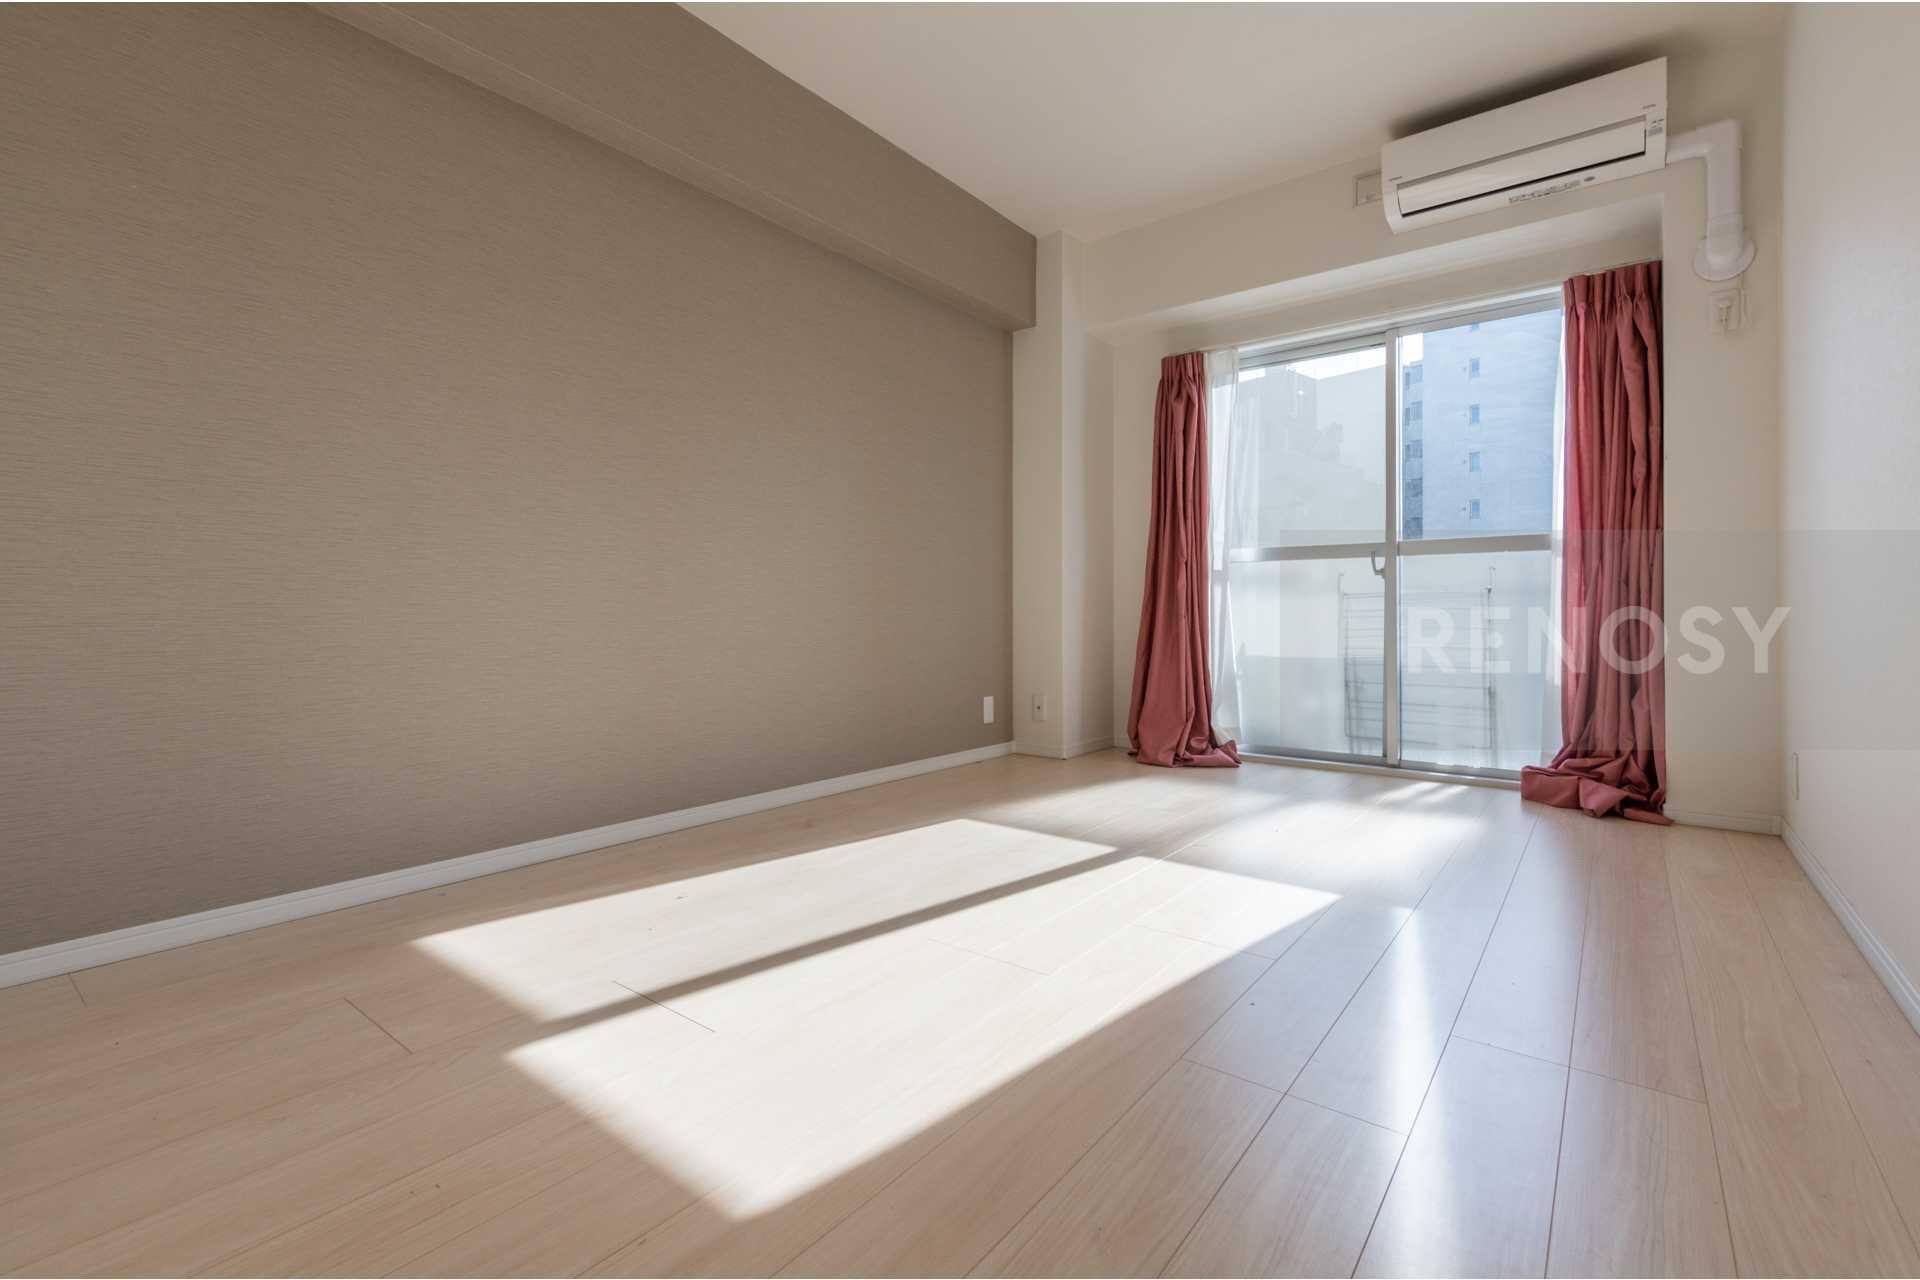 29_【ldd3_sell】五反田リーラハイタウン903号室_20201202195859.jpg